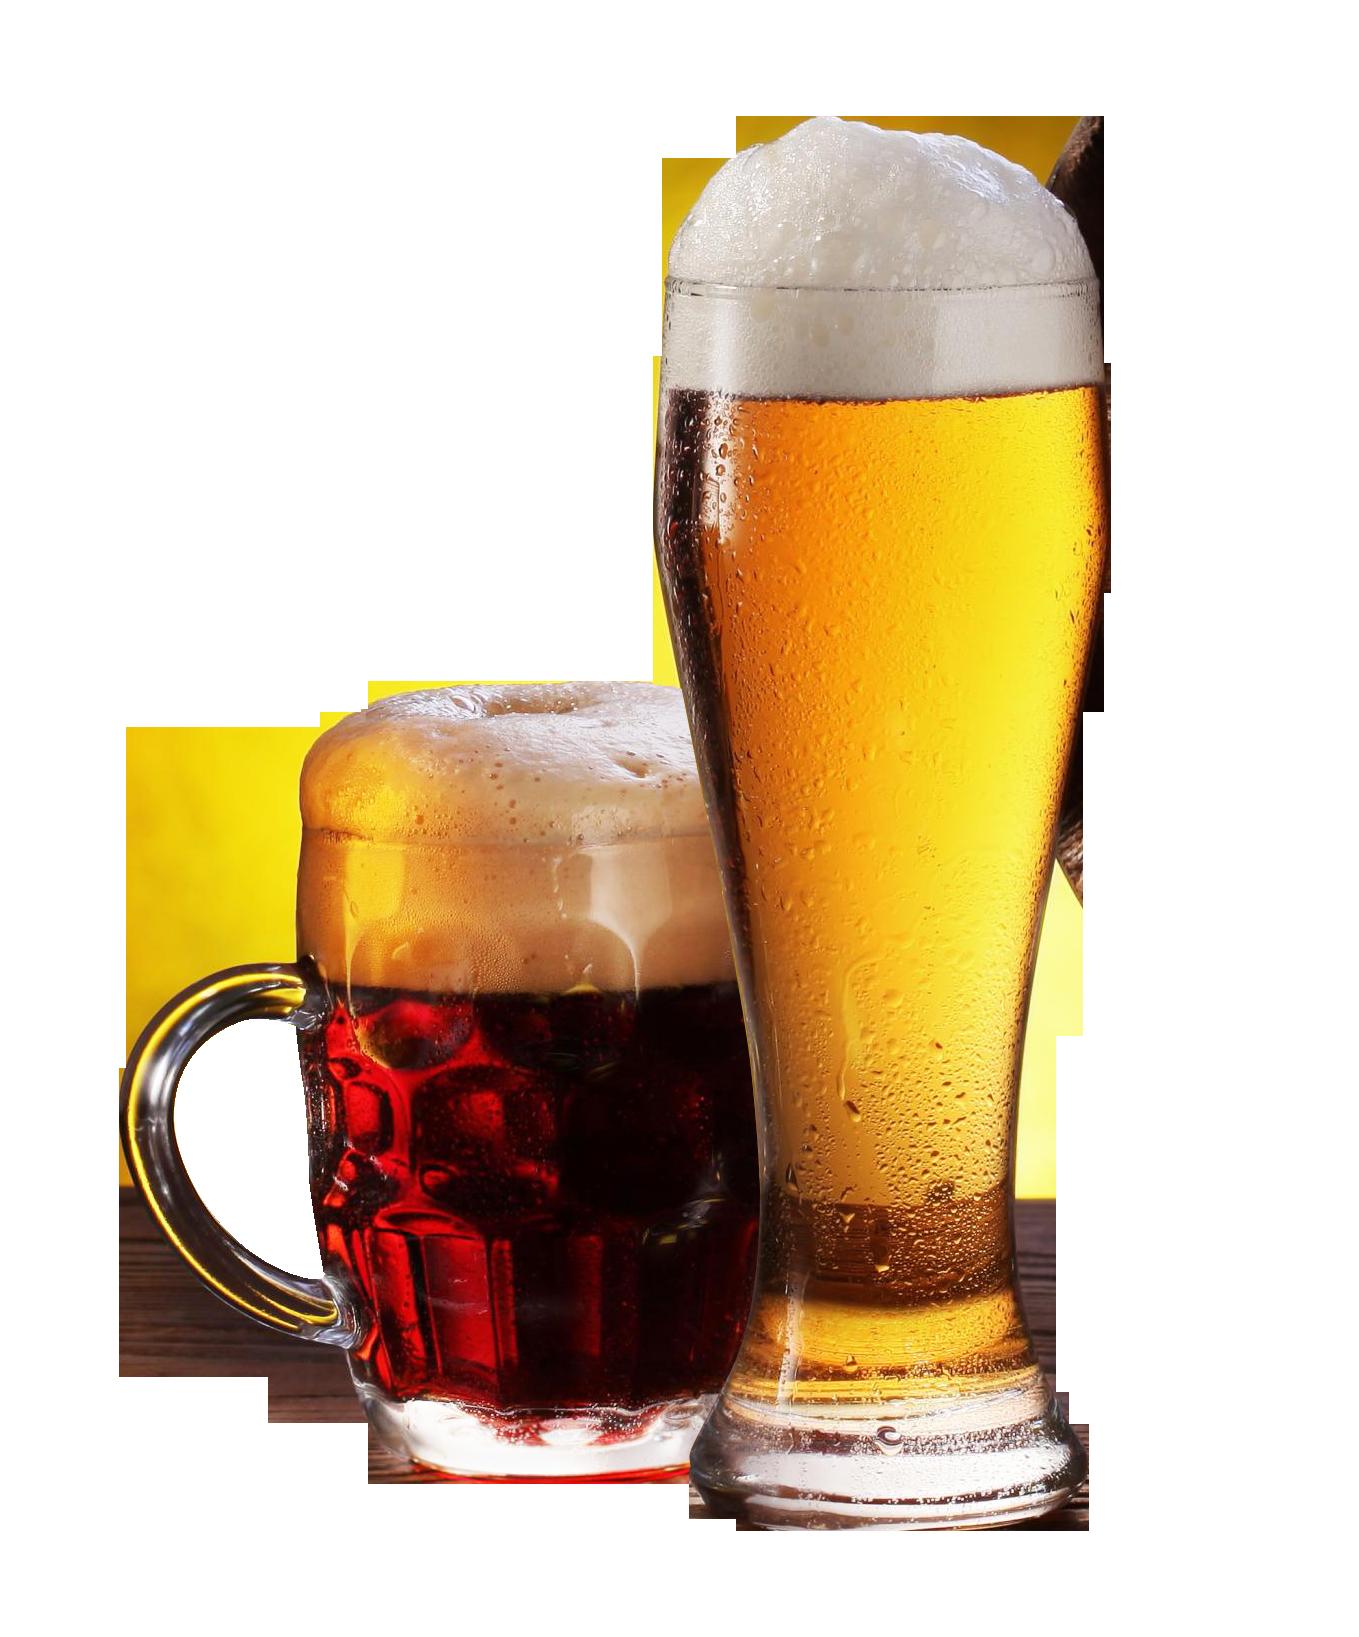 Beer Glass Png Image Beer Glass Beer Beer Glasses